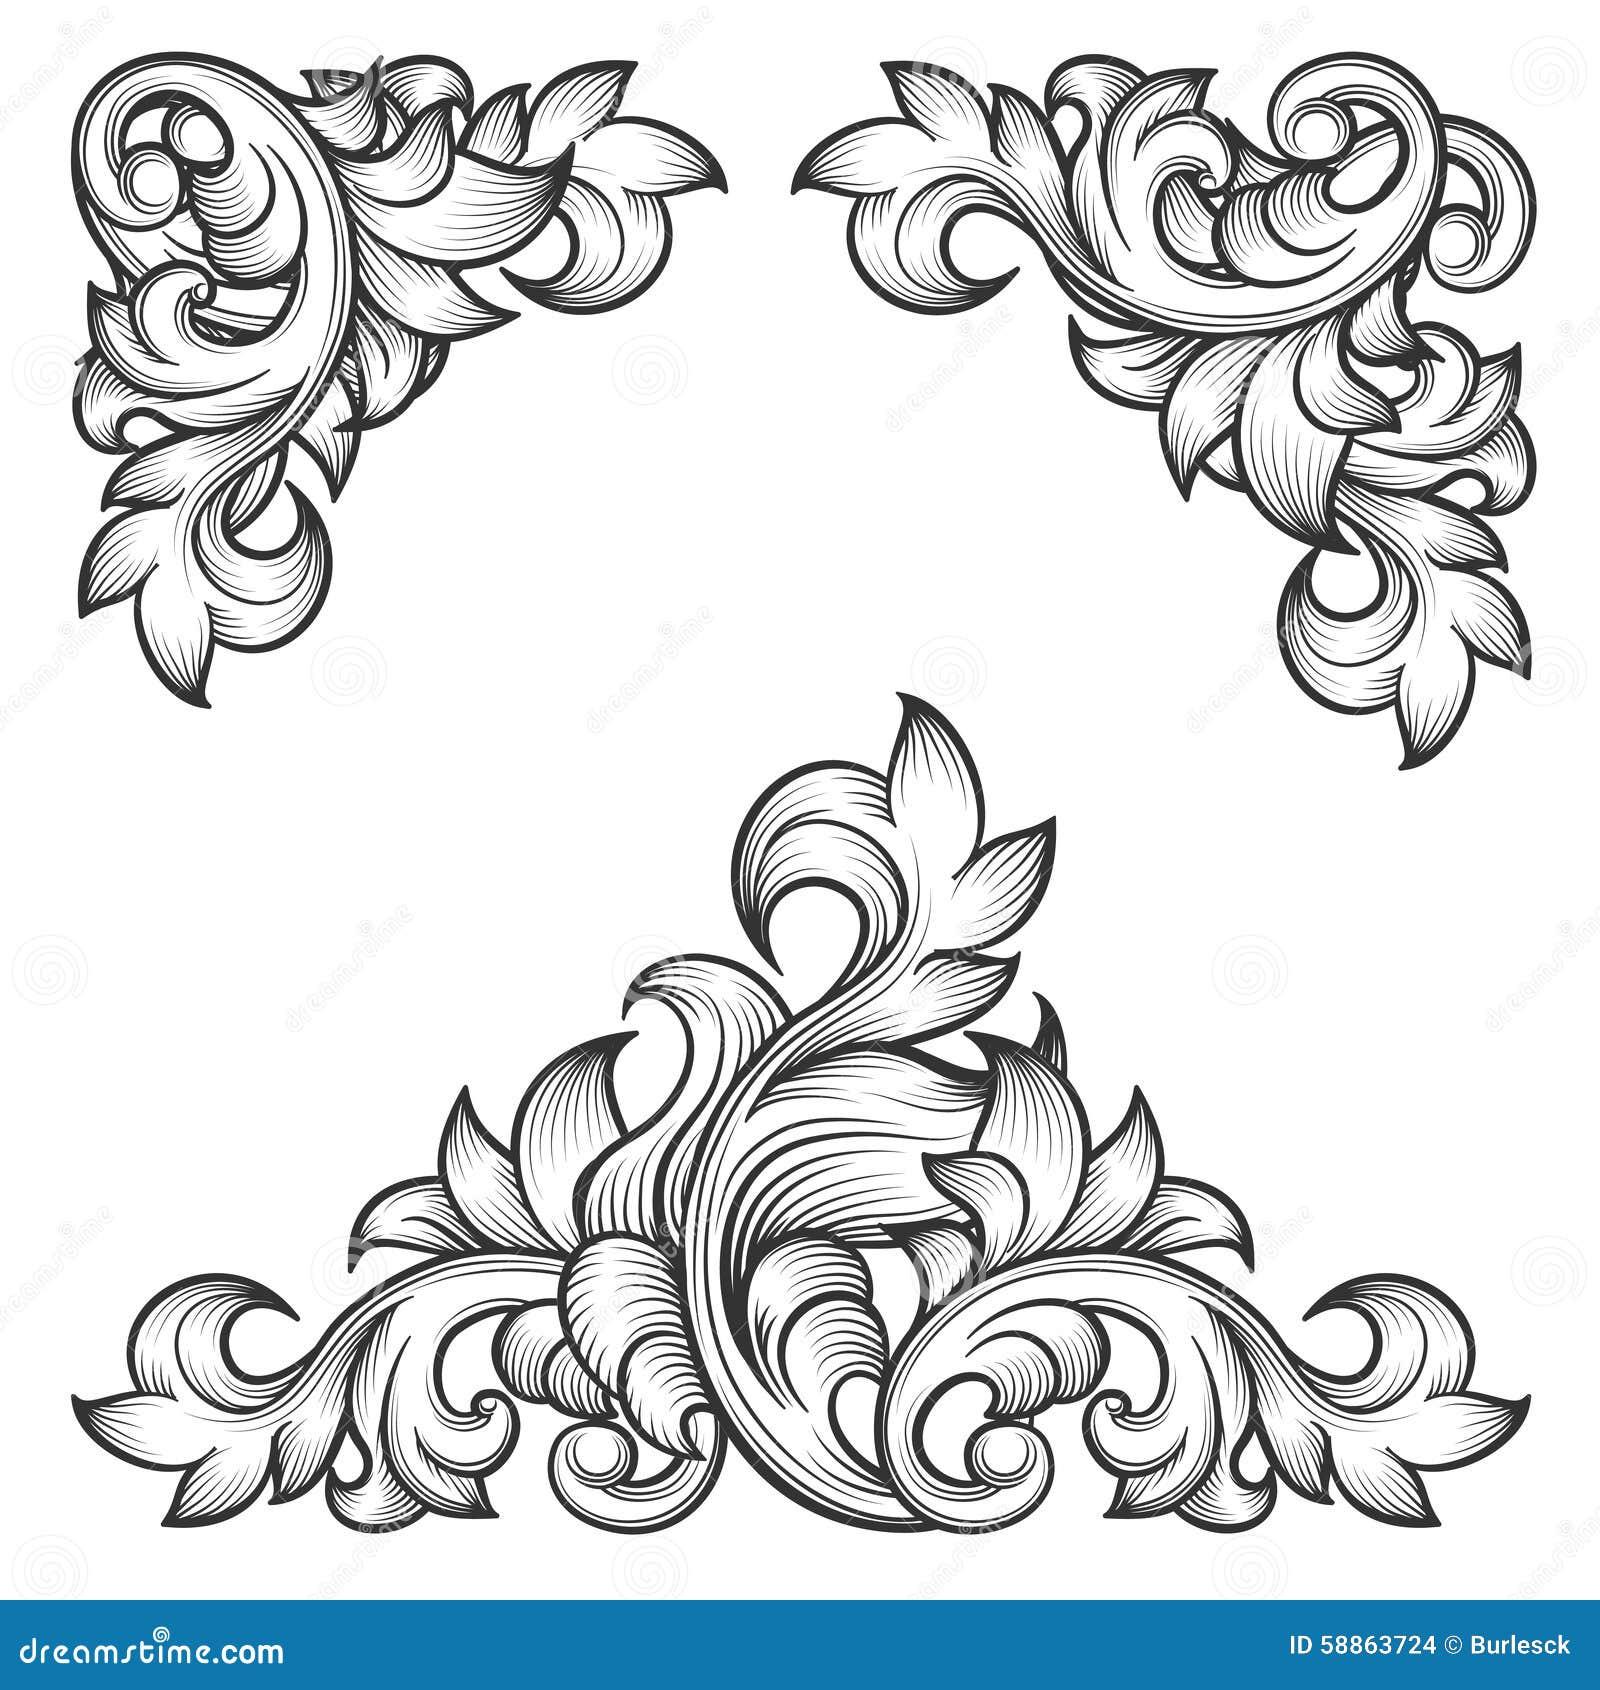 Swirl Design Vector Illustration